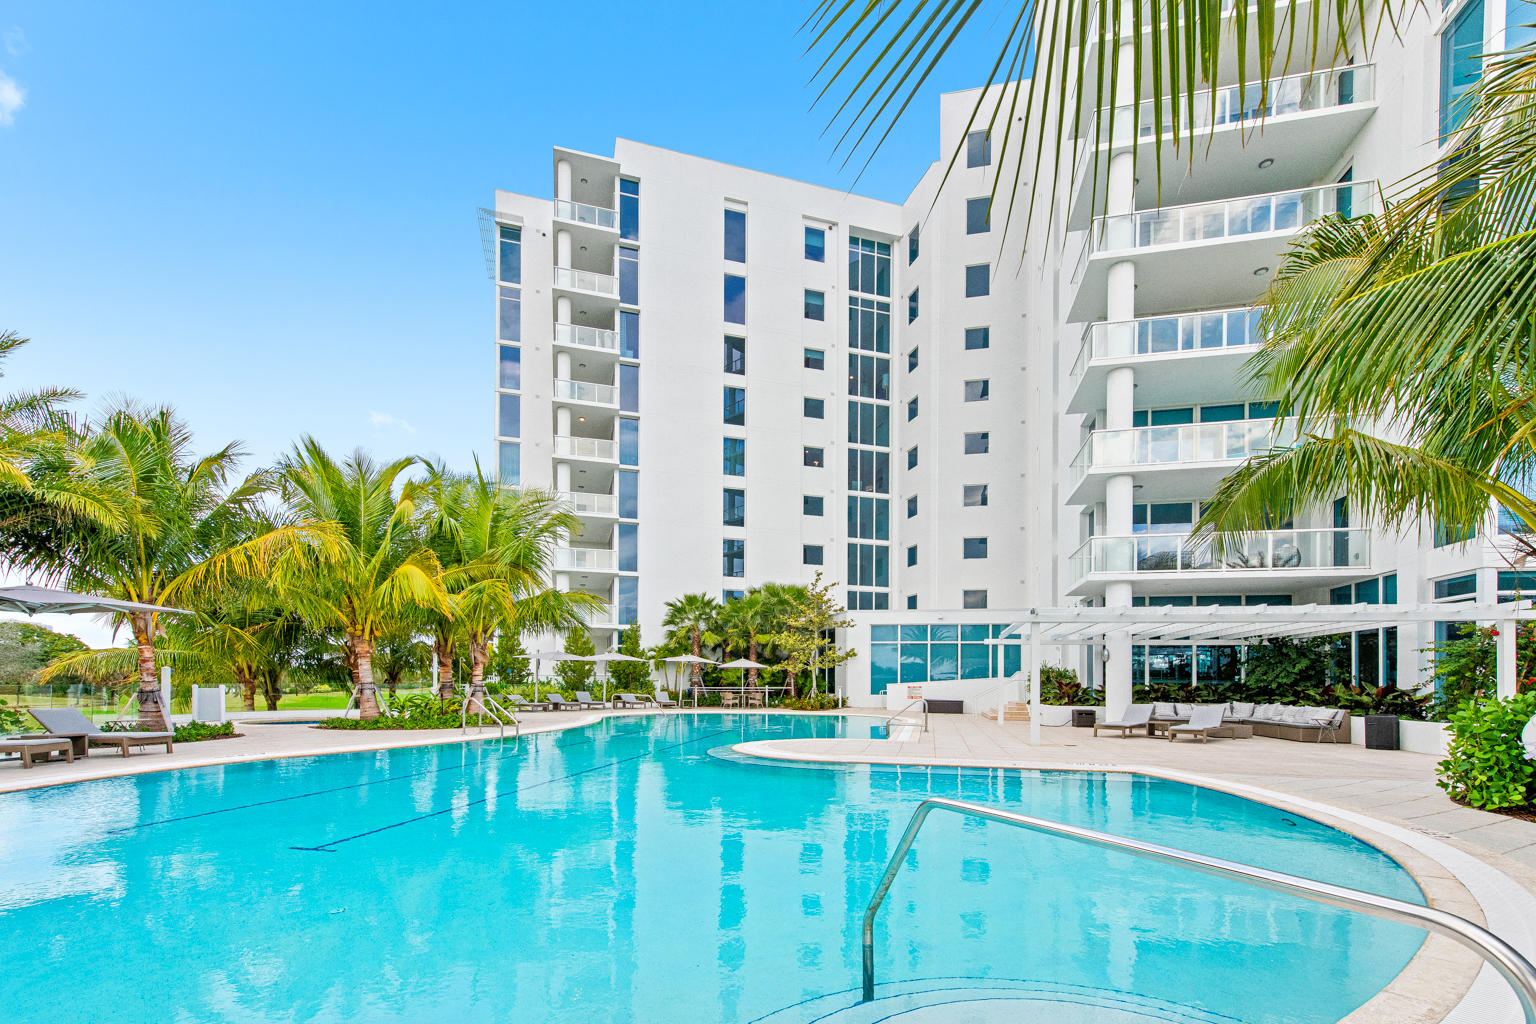 20155 Boca West Drive #a901 Boca Raton, FL 33434